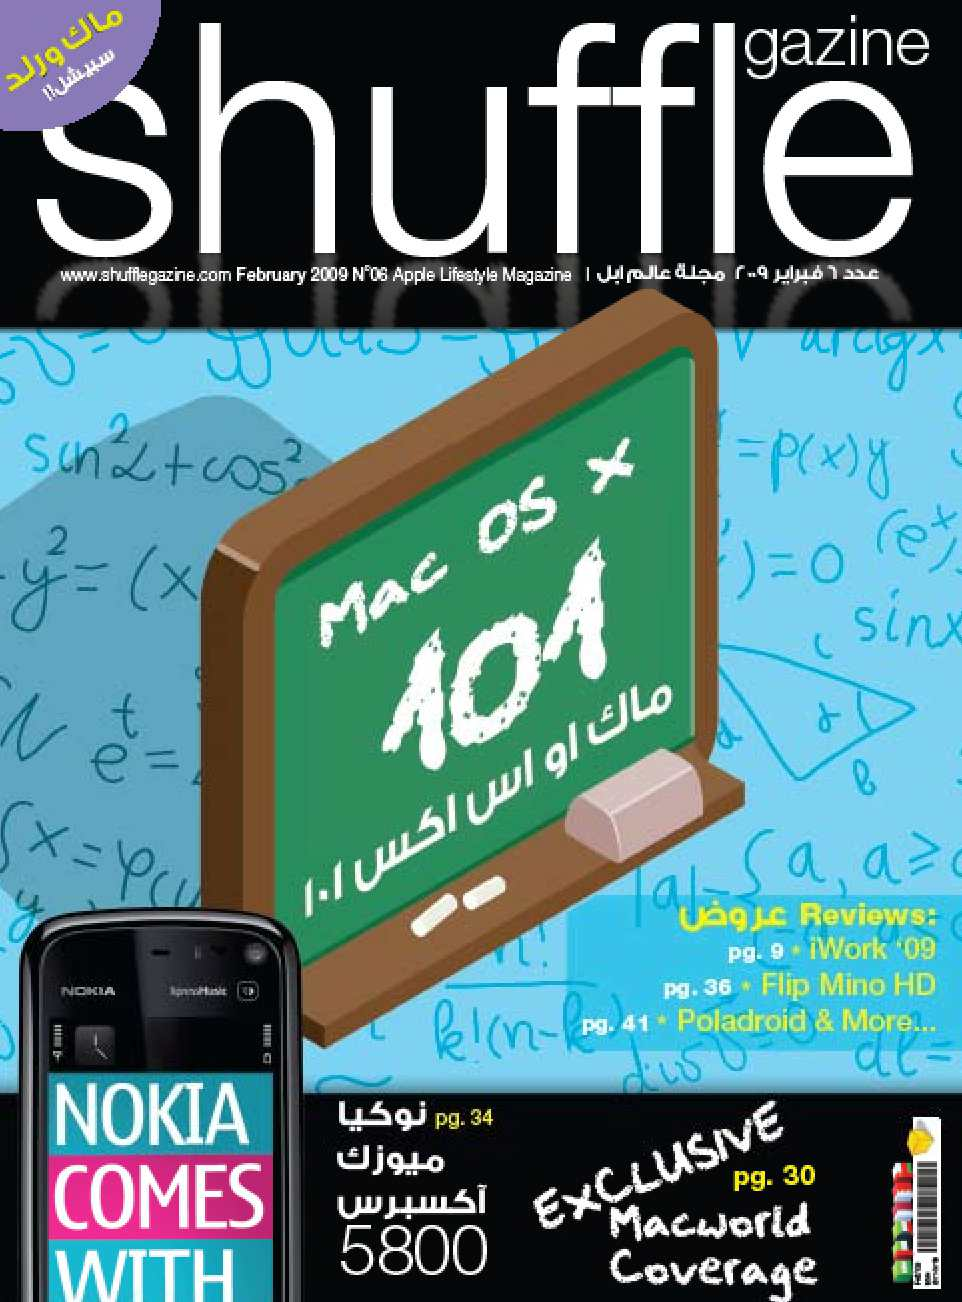 Calaméo - Shufflegazine February 2009